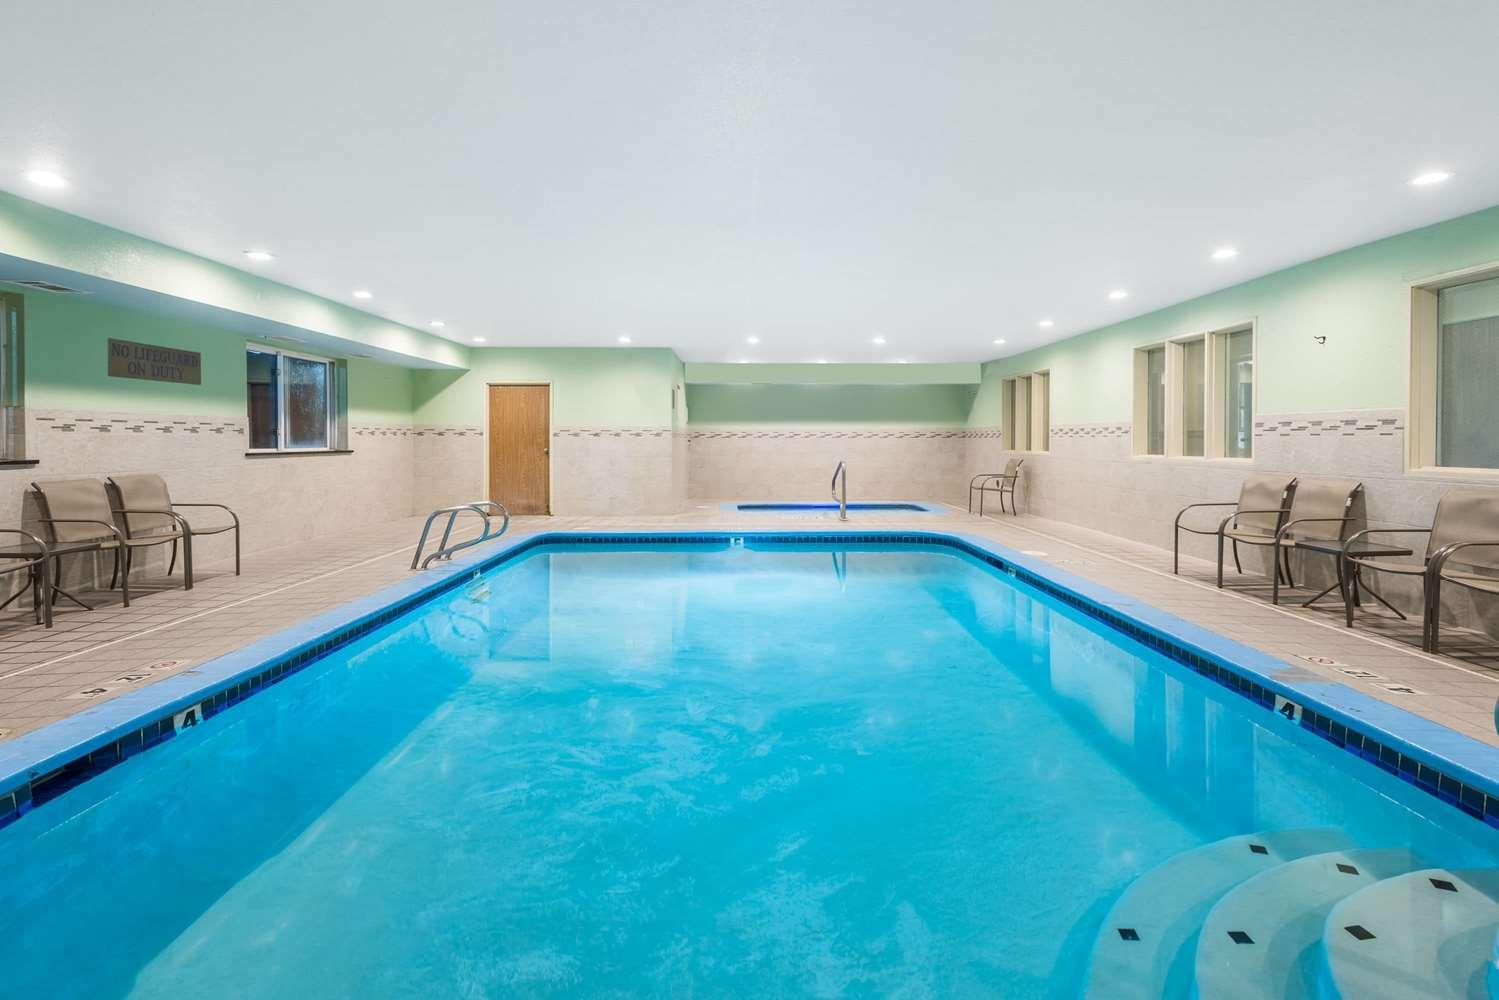 Pool - Ramada Hotel Coeur d'Alene